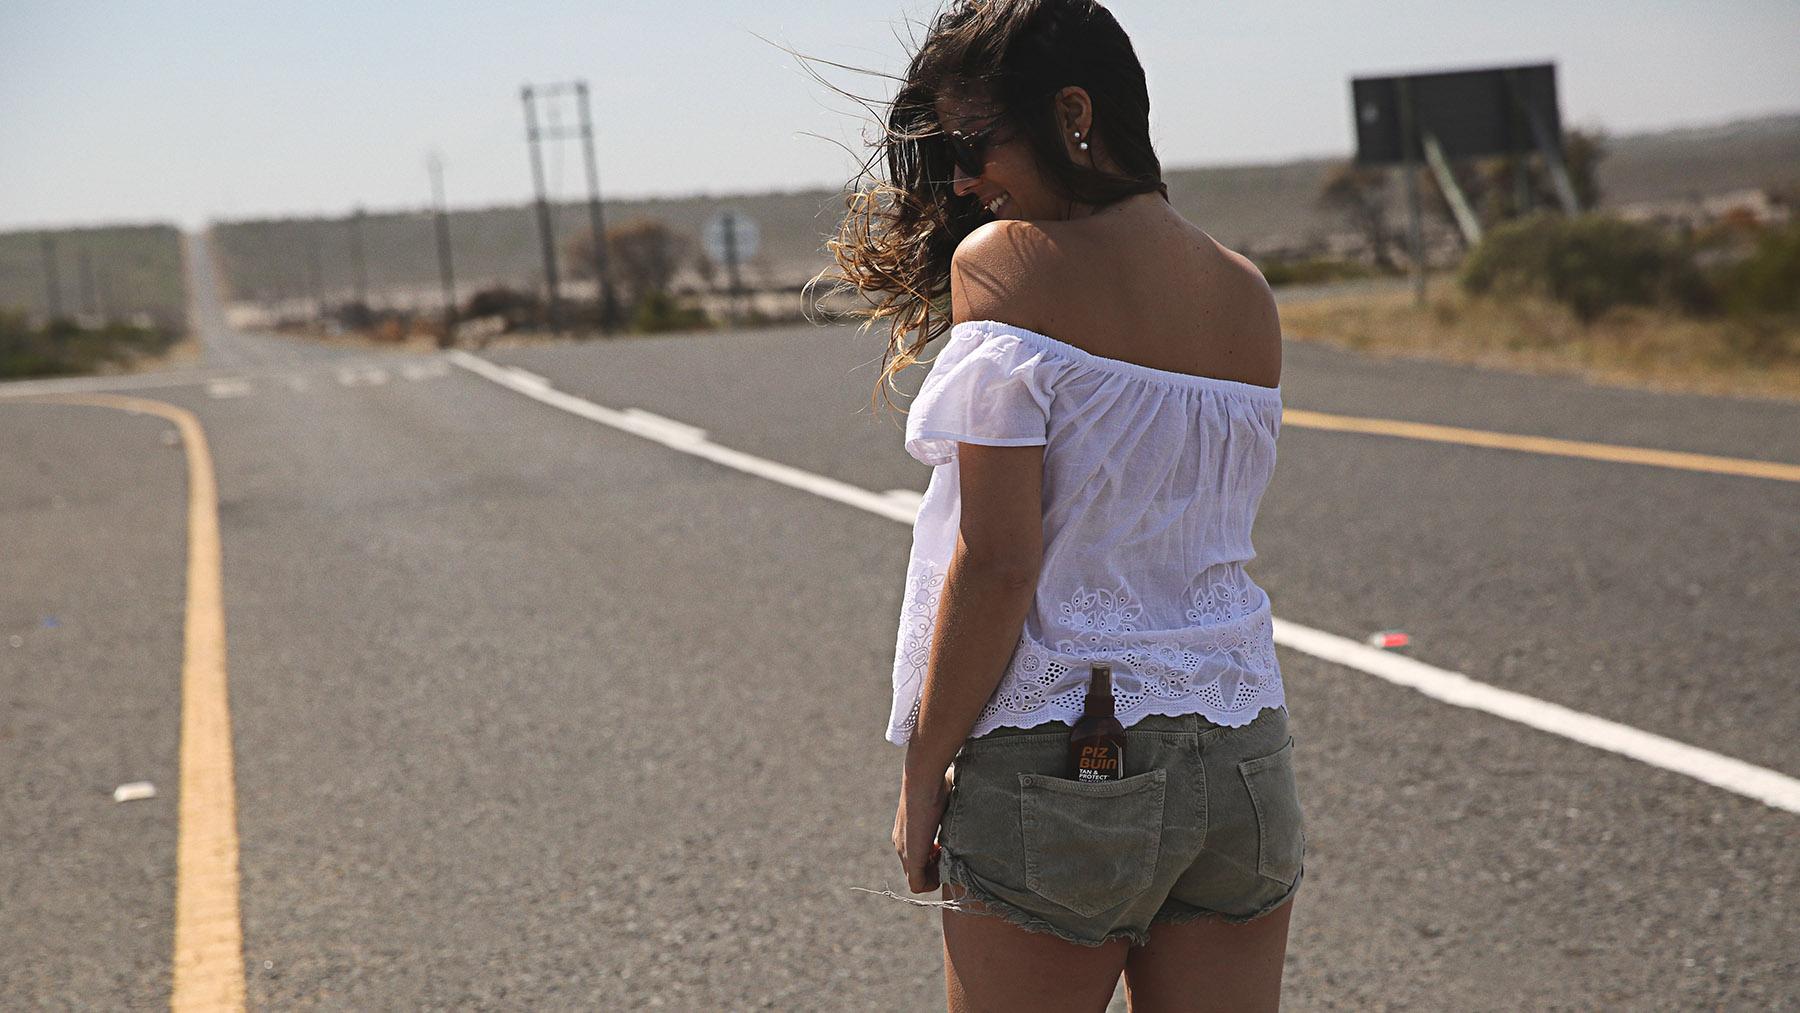 trendy-taste-look-outfit-street-style-ootd-blog-blogger-fashion-spain-moda-españa-piz-buin-sa-south-africa-cape-town-spot-summer-verano-12